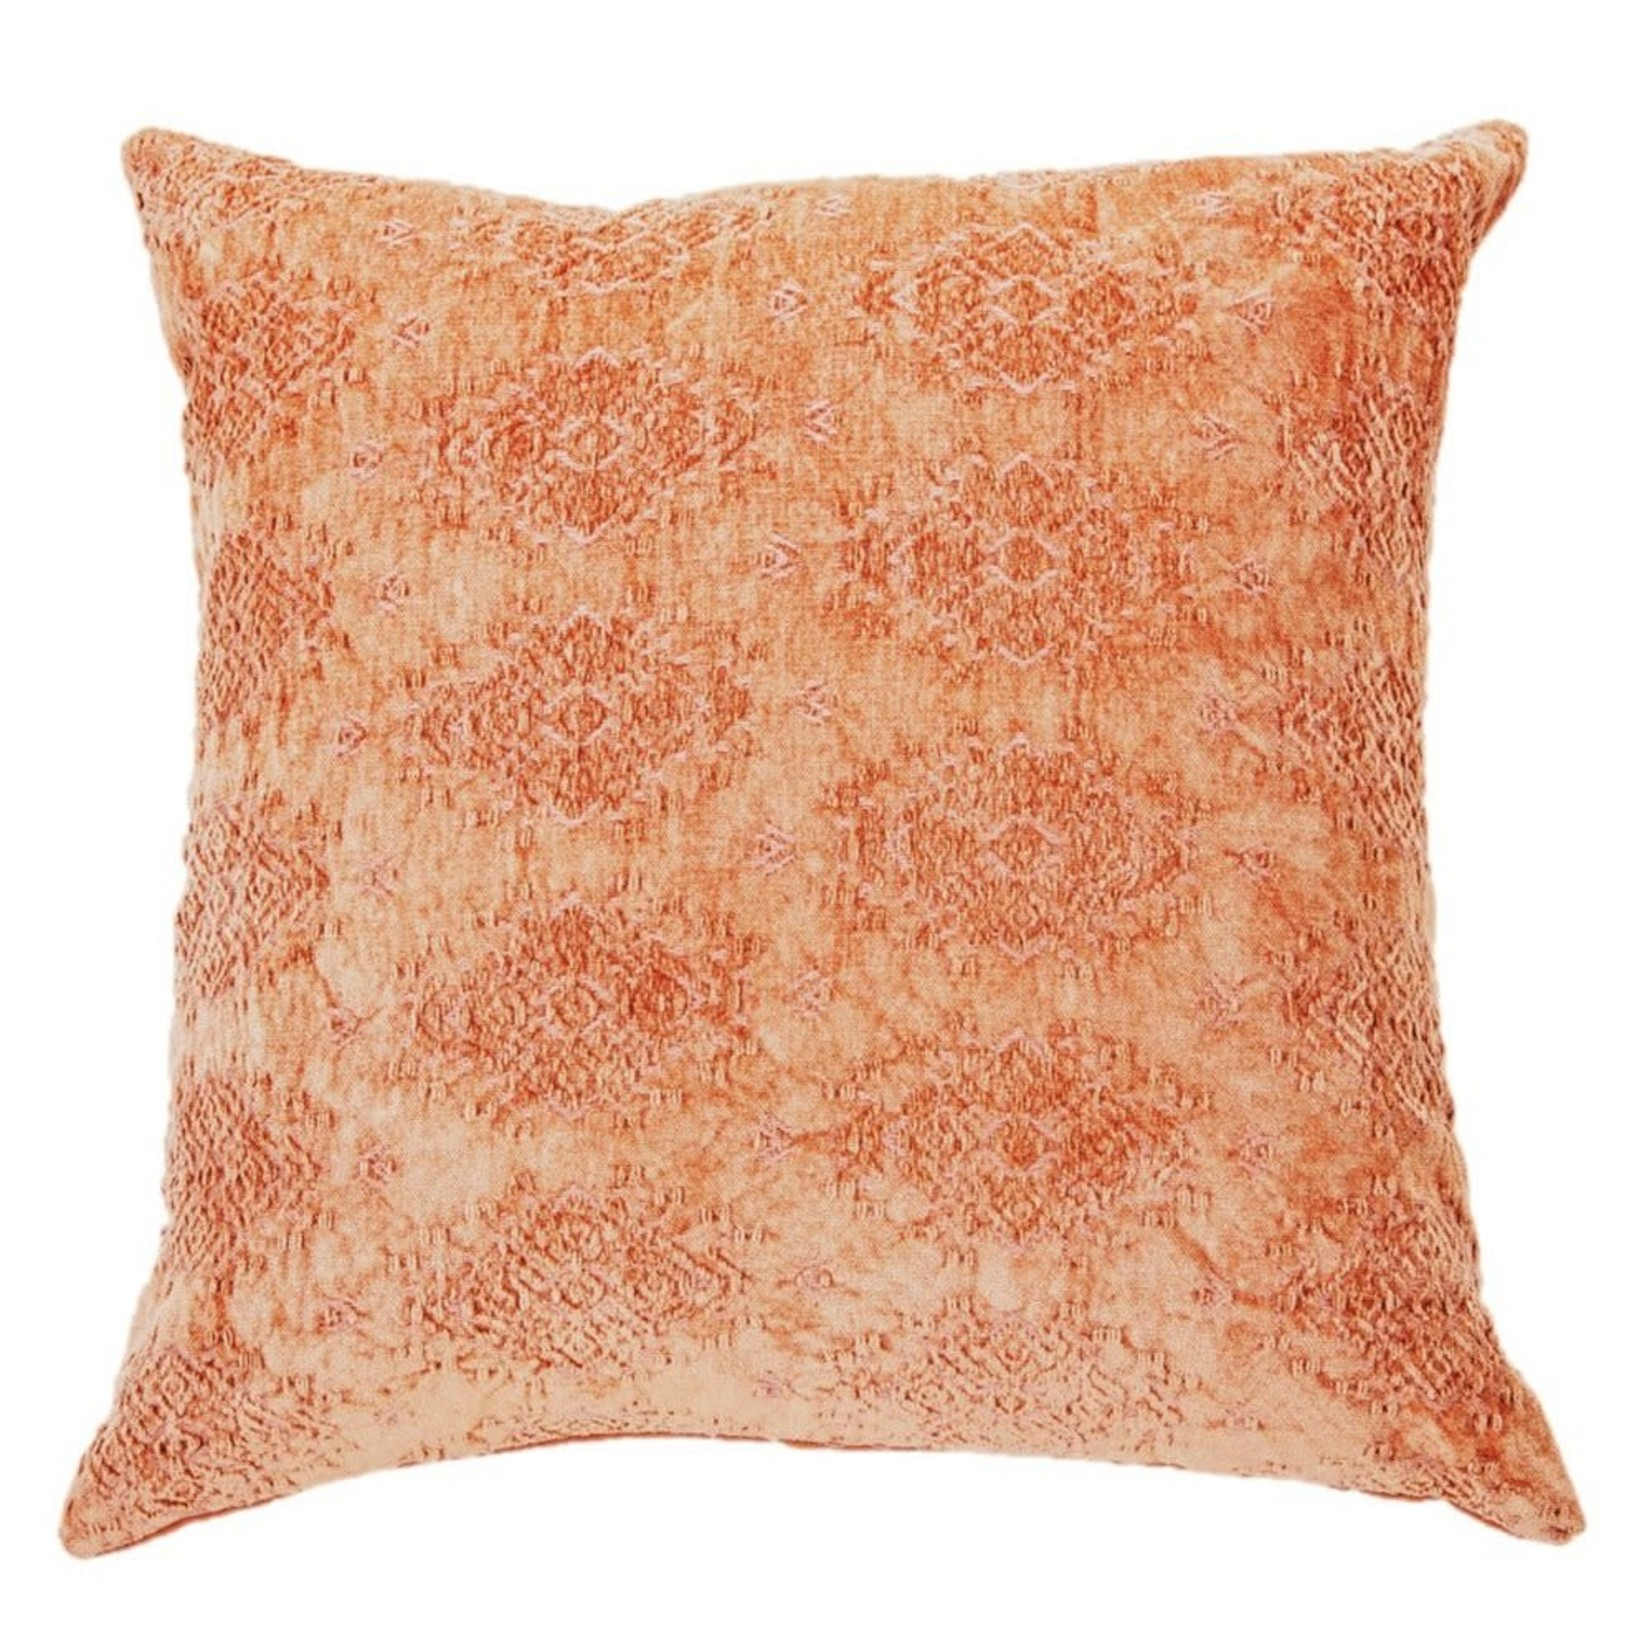 Toro Terracotta European Pillow